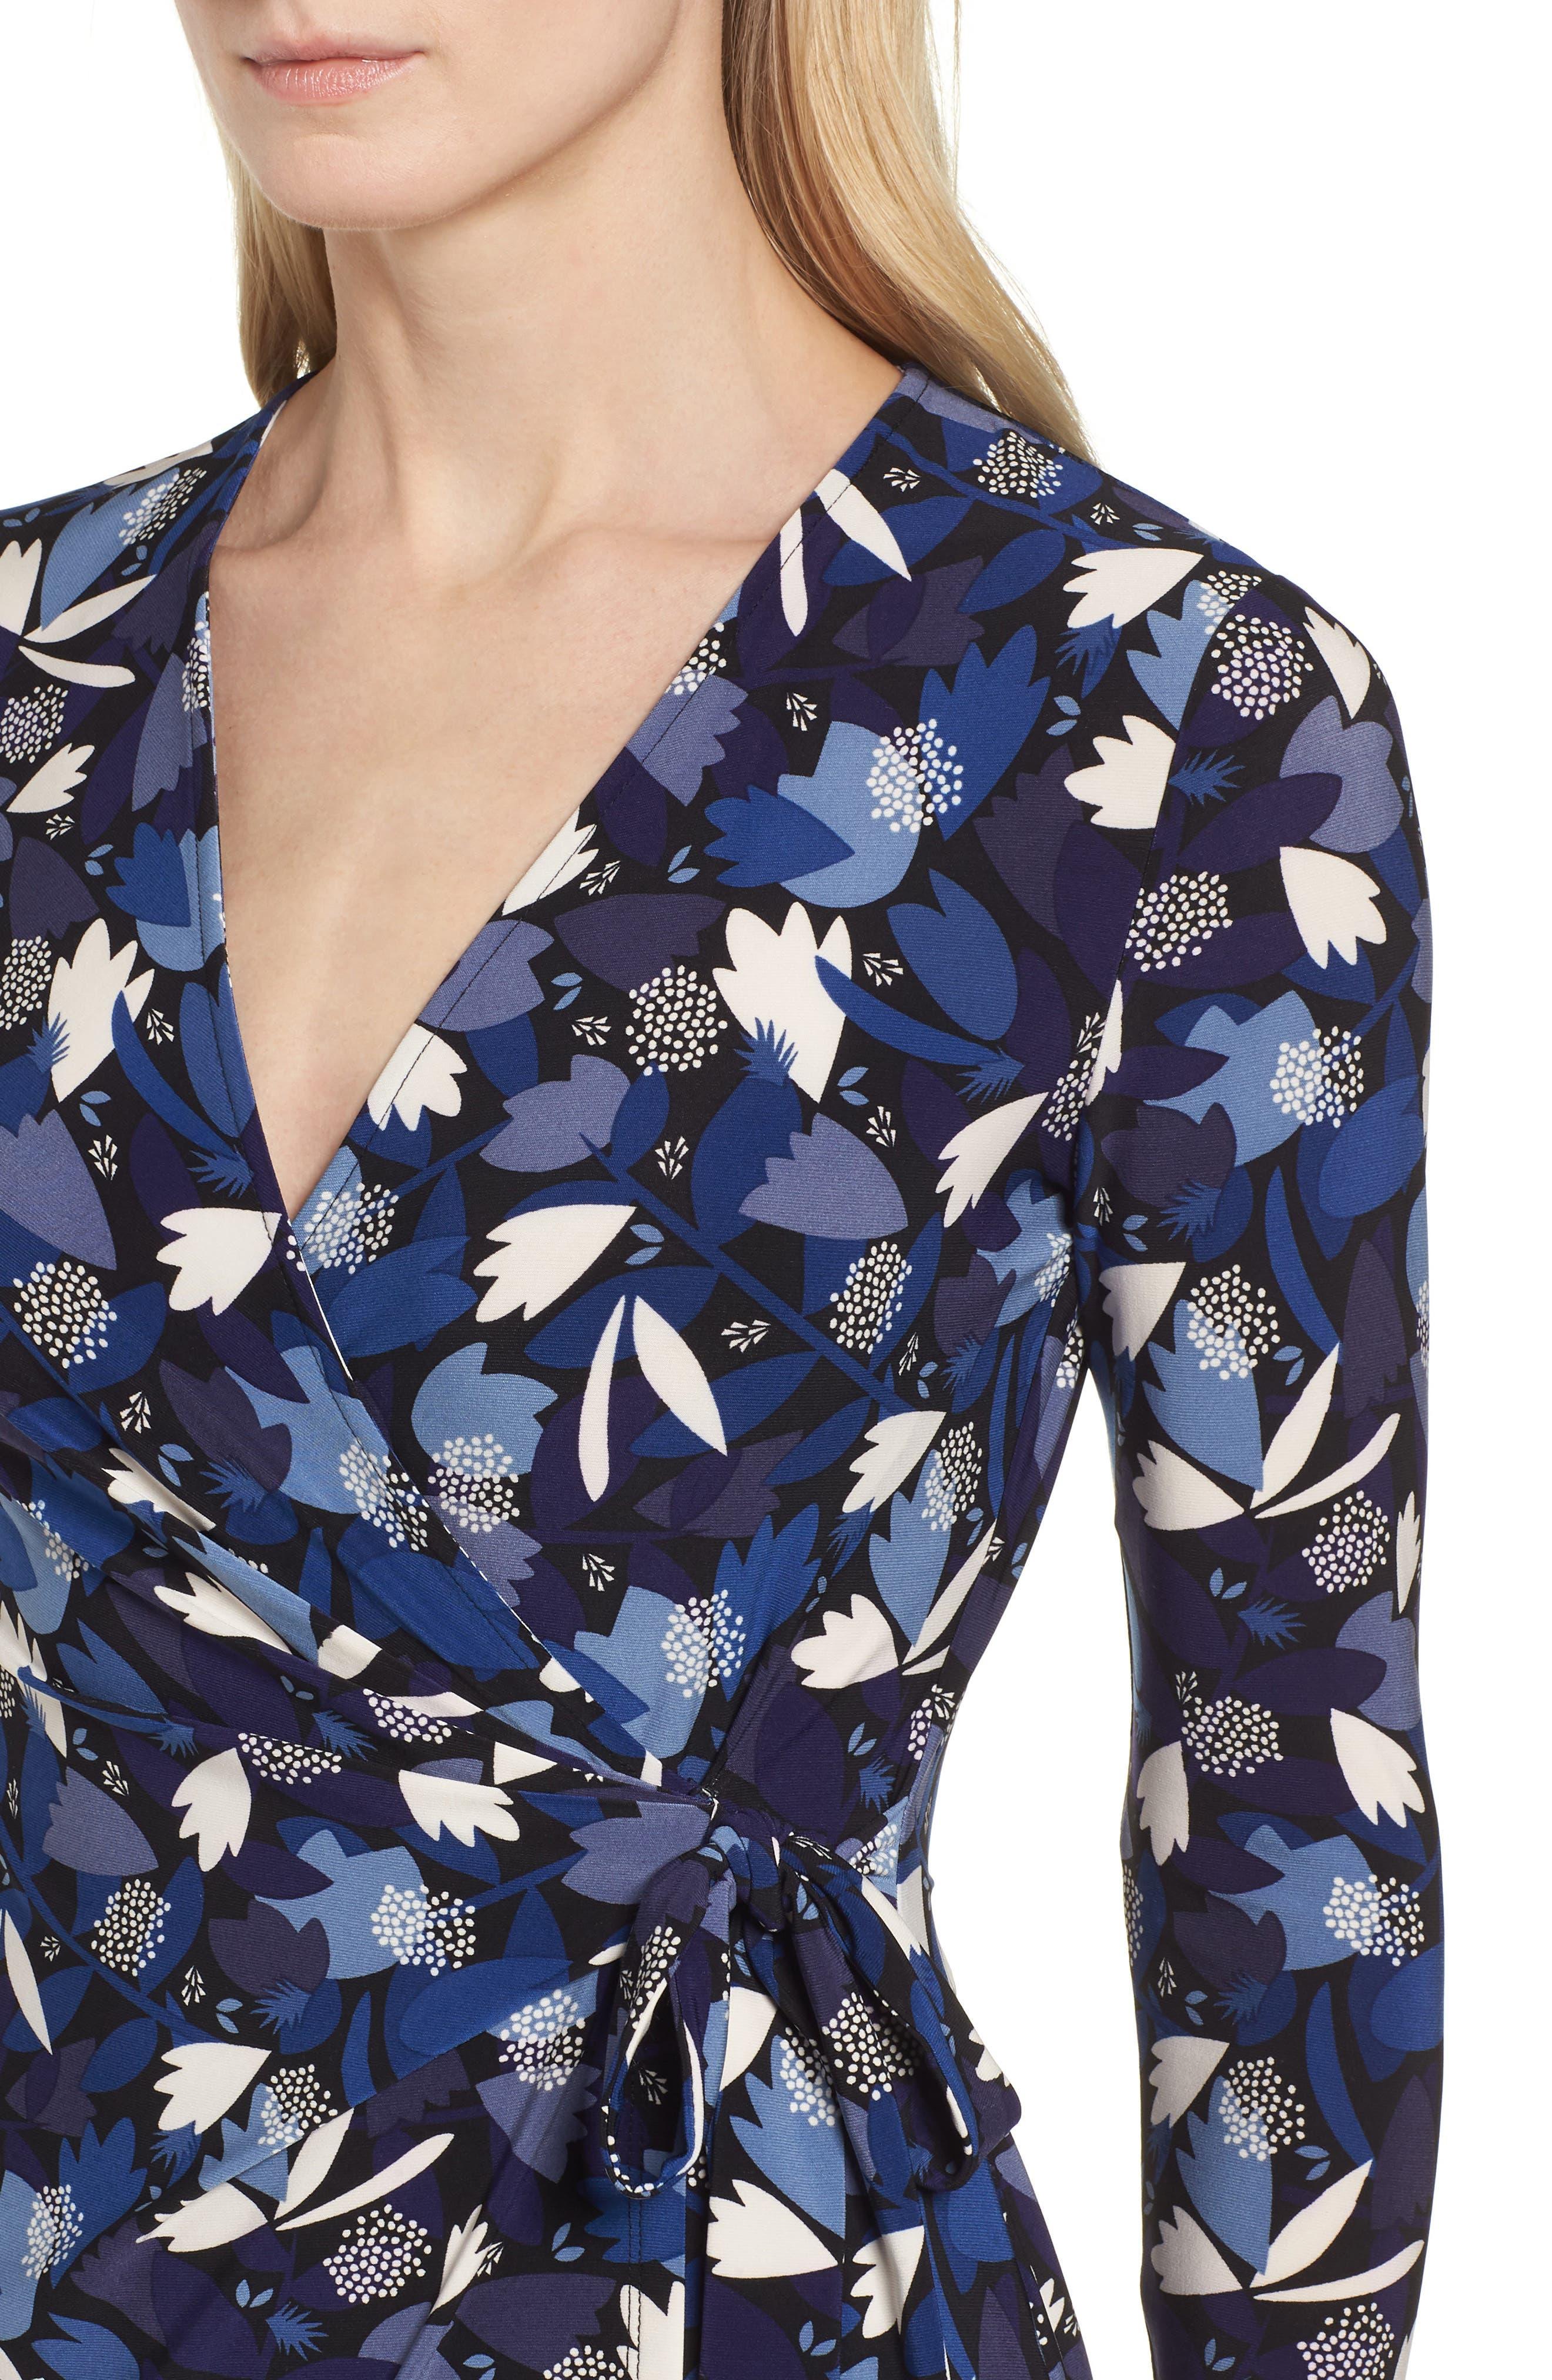 Amalfi Print Classic Wrap Dress,                             Alternate thumbnail 4, color,                             410